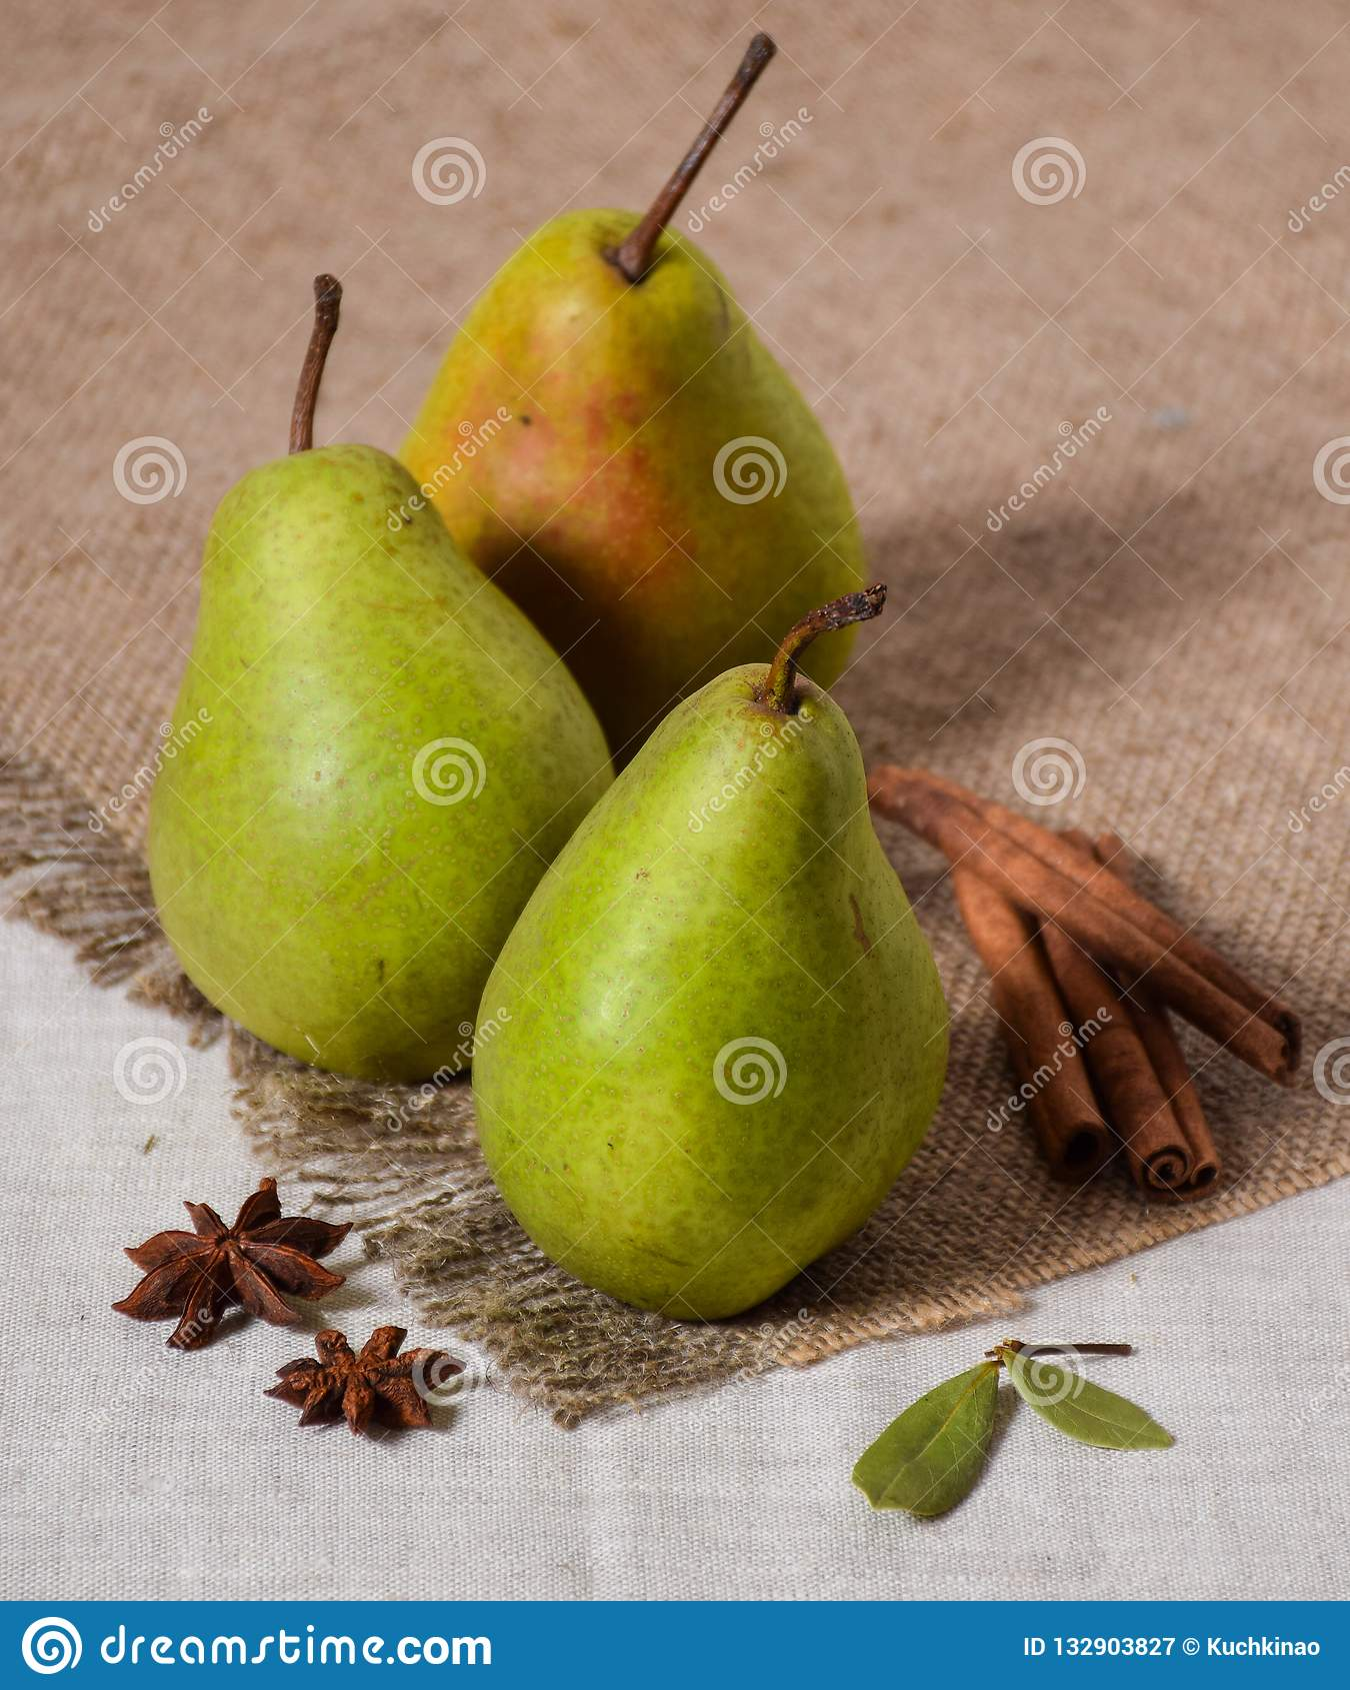 Tree green pear rustic style cinammon anis fruit fresh burlap